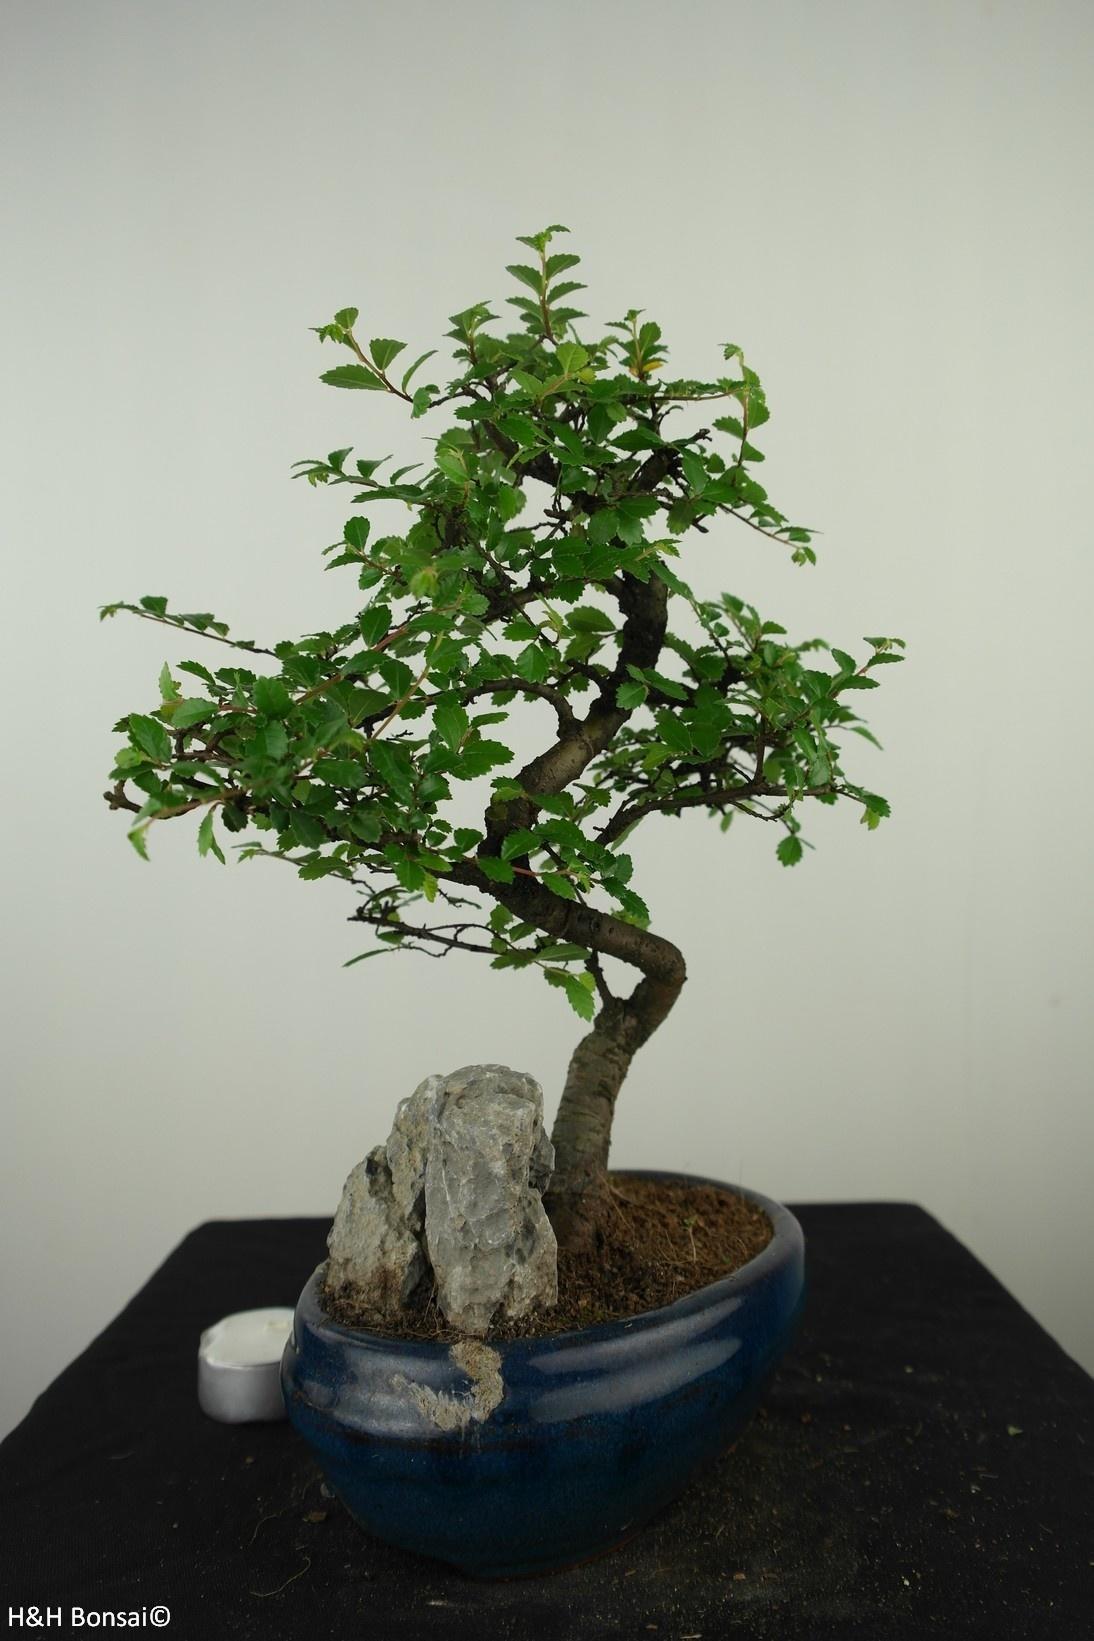 Bonsai Chinese Elm with rock, Ulmus, no. 7615